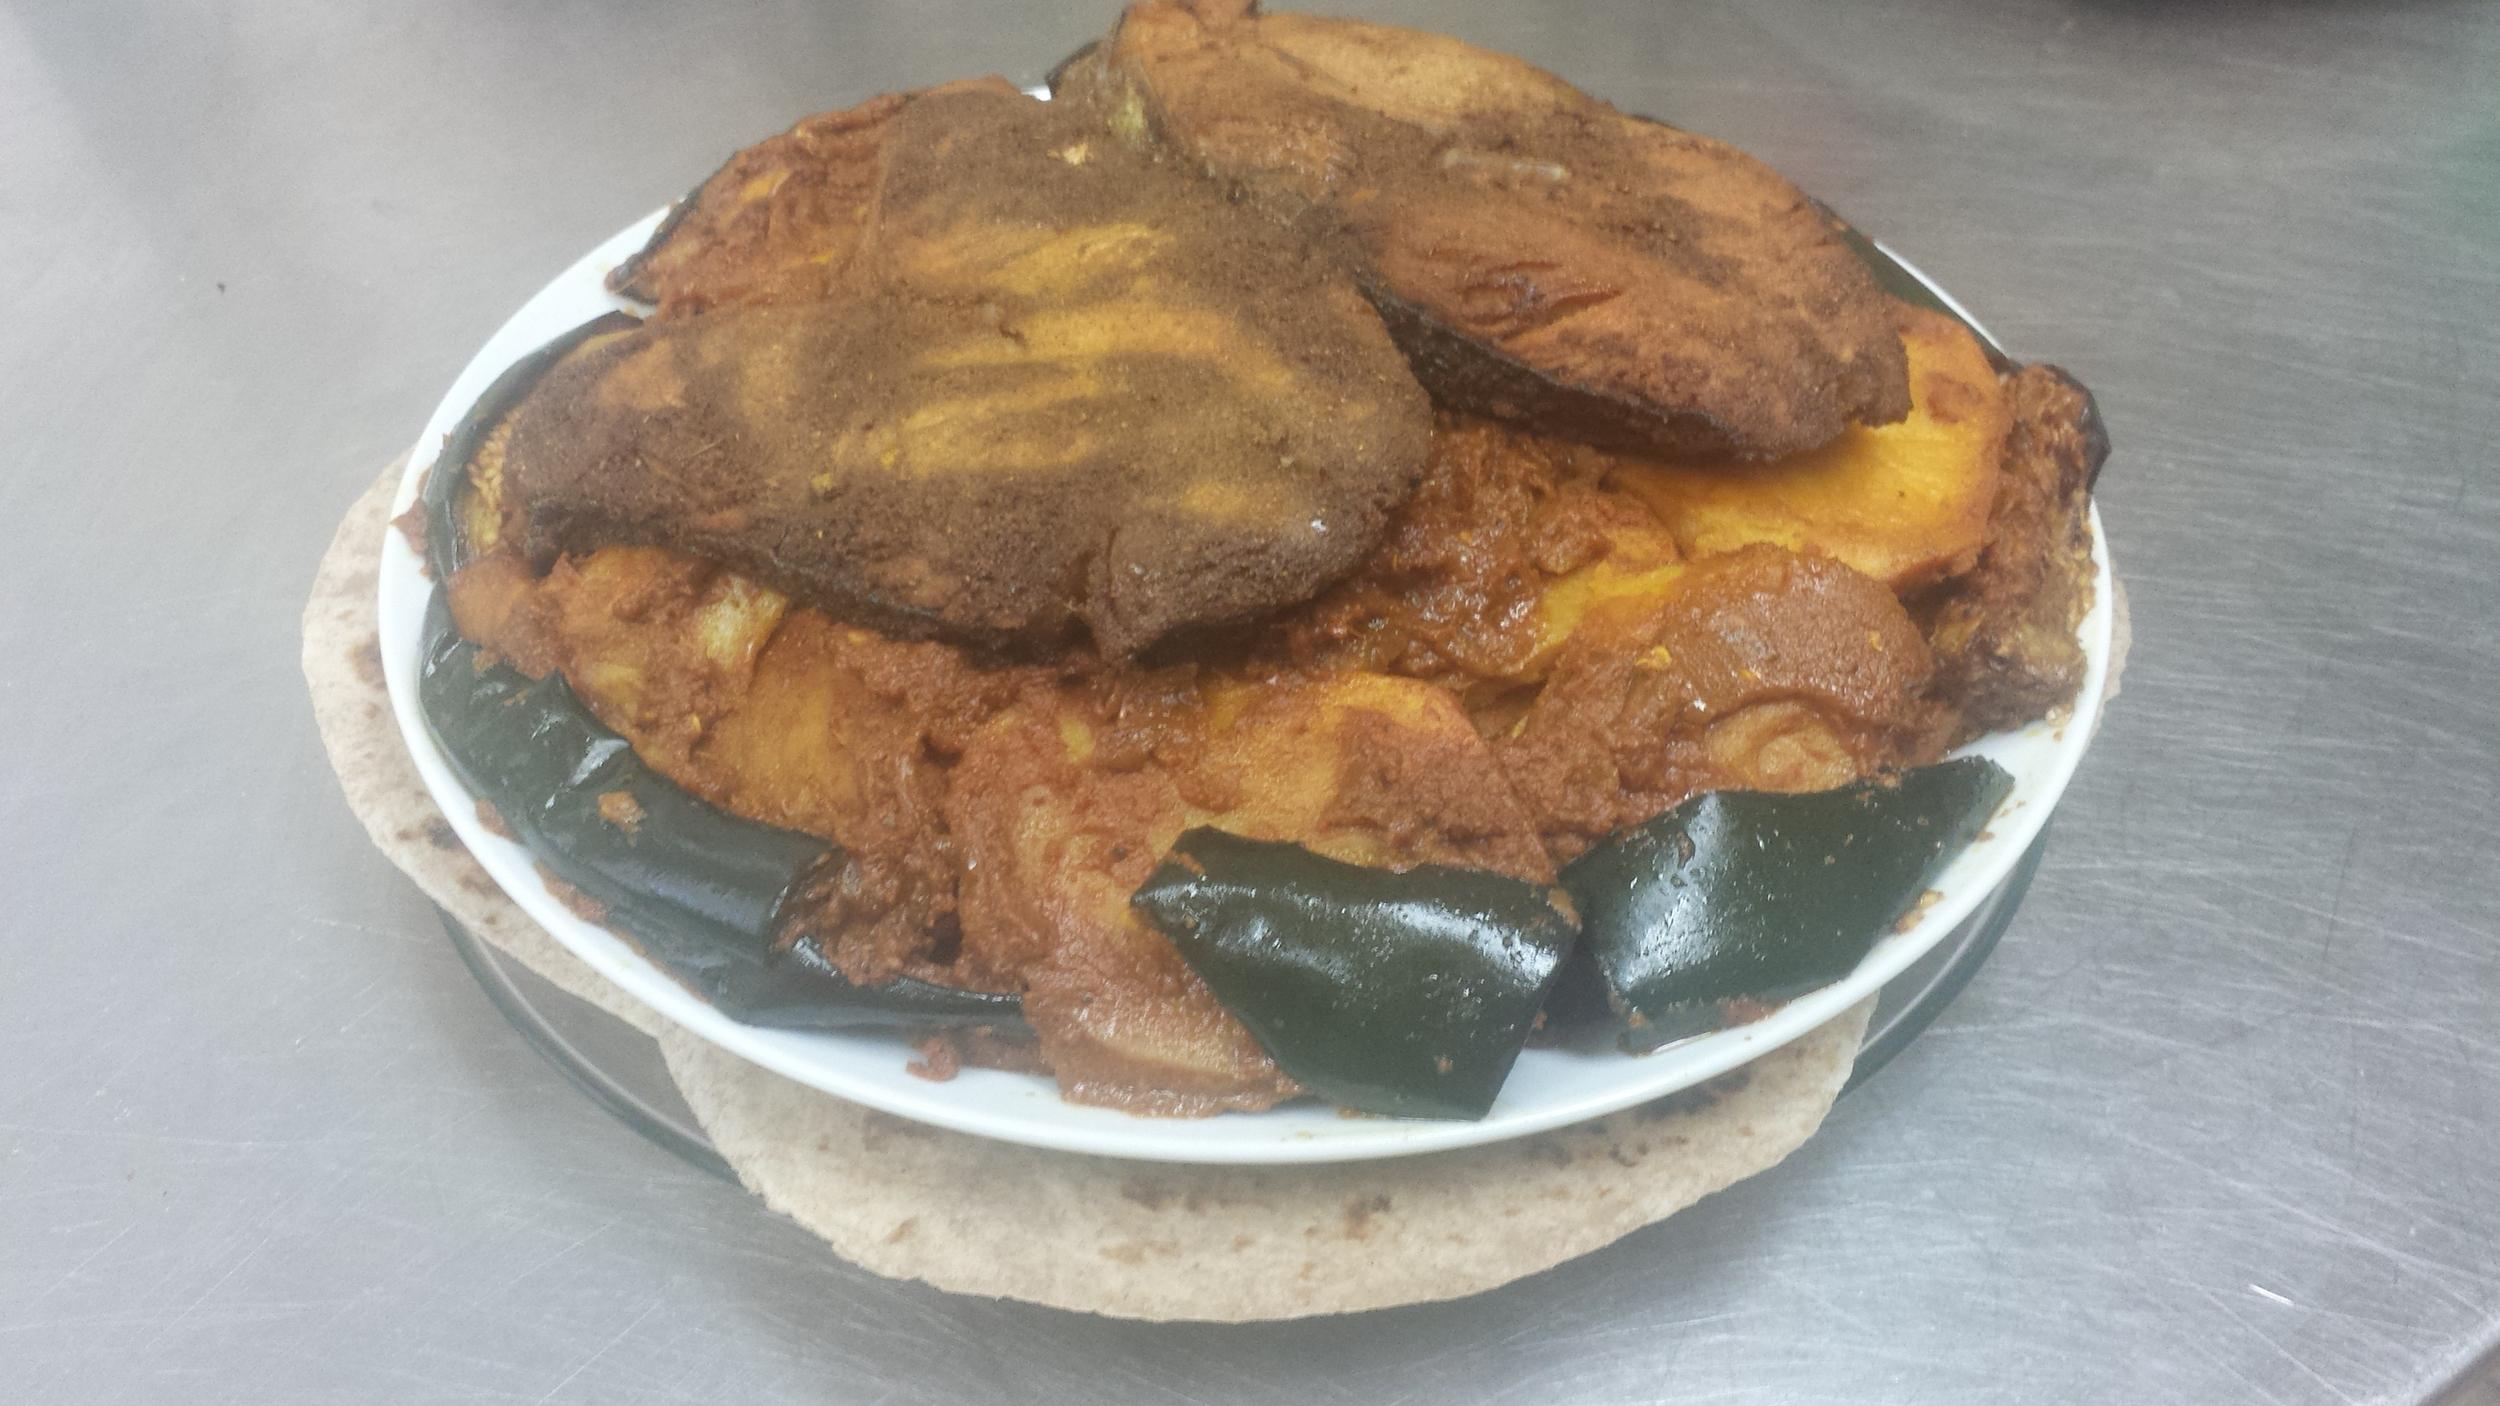 Masala Fish(2 Pcs), Potatoes and Rotli 2